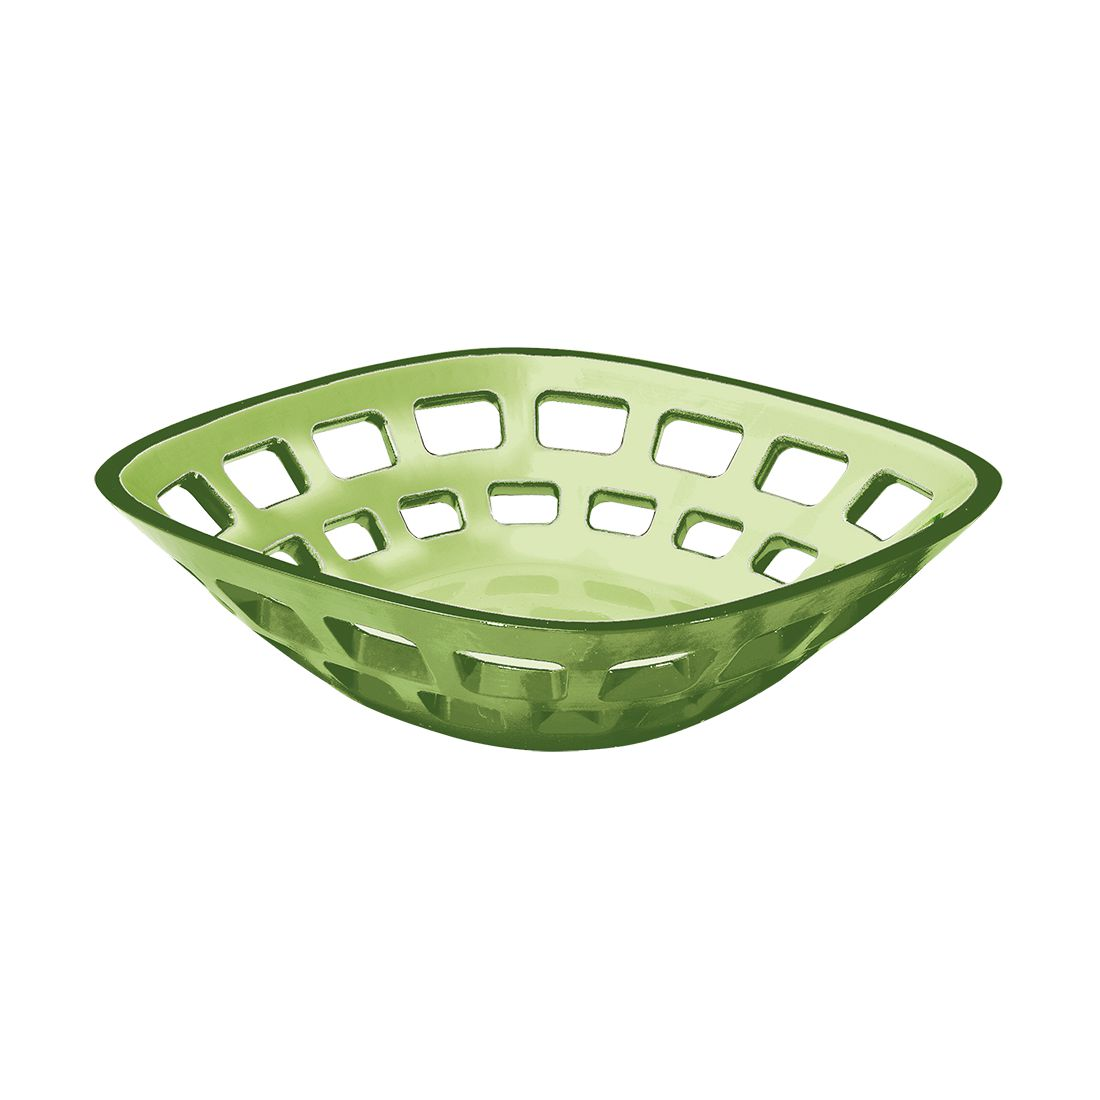 Brotkorb Glam – Kunststoff Apfelgrün, Guzzini günstig bestellen